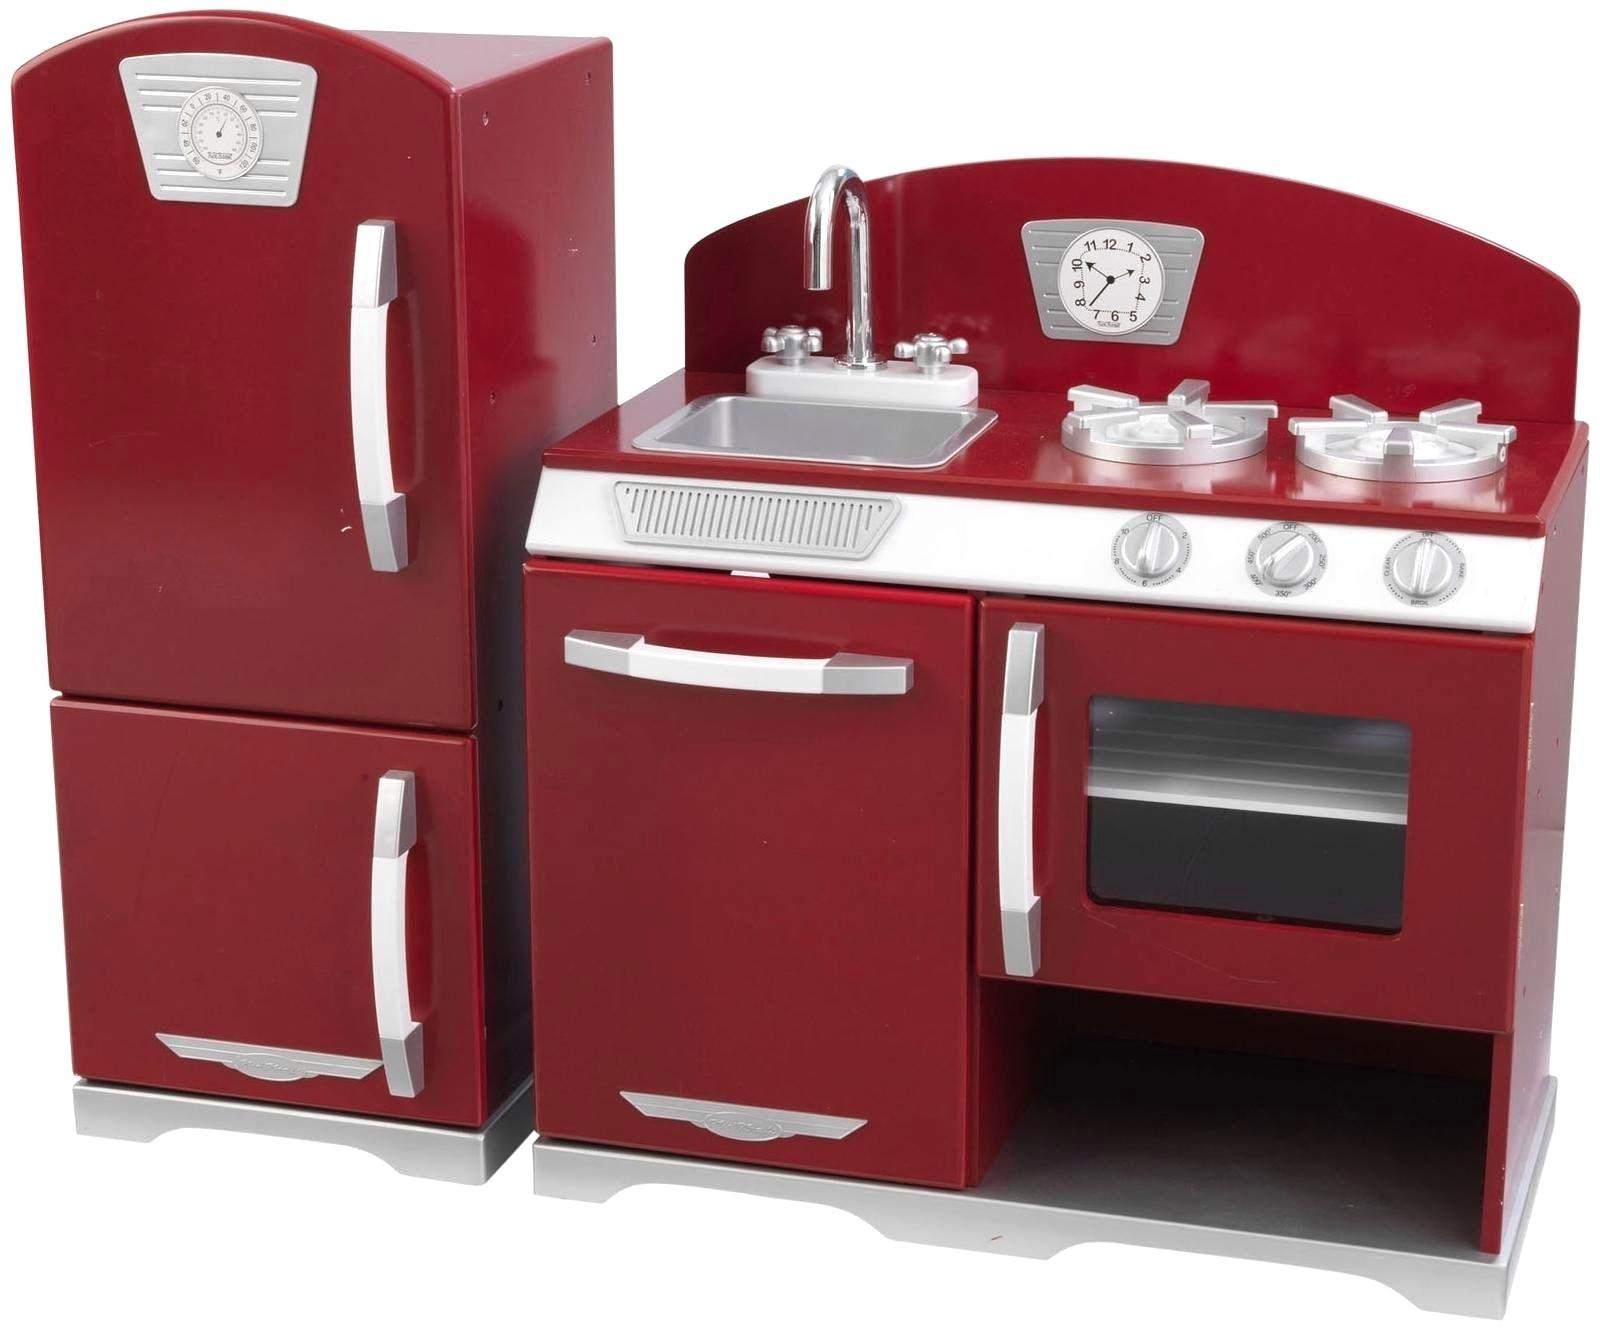 Kidkraft Red Retro Kitchen Replacement Parts Pleasant Vintage Kitchen Set White Ks Raft Red Retro